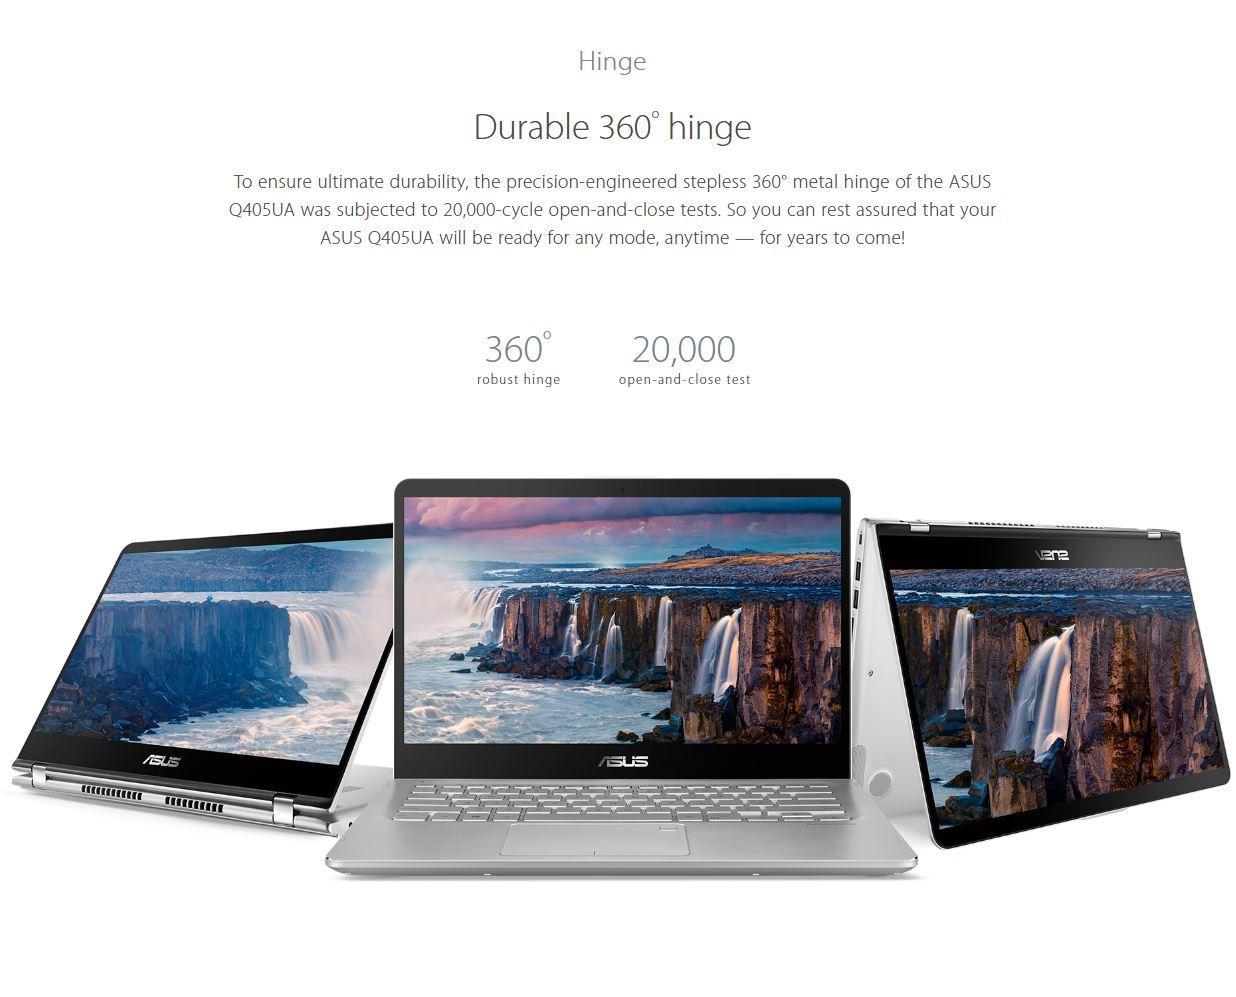 ASUS Q405UA 14 0-inch 2-in-1 Touchscreen FHD (1920x1080) Laptop PC, Intel  i5-8250U up to 3 4GHz, 8GB DDR4 SDRAM, 128GB SSD, Fingerprint Reader,